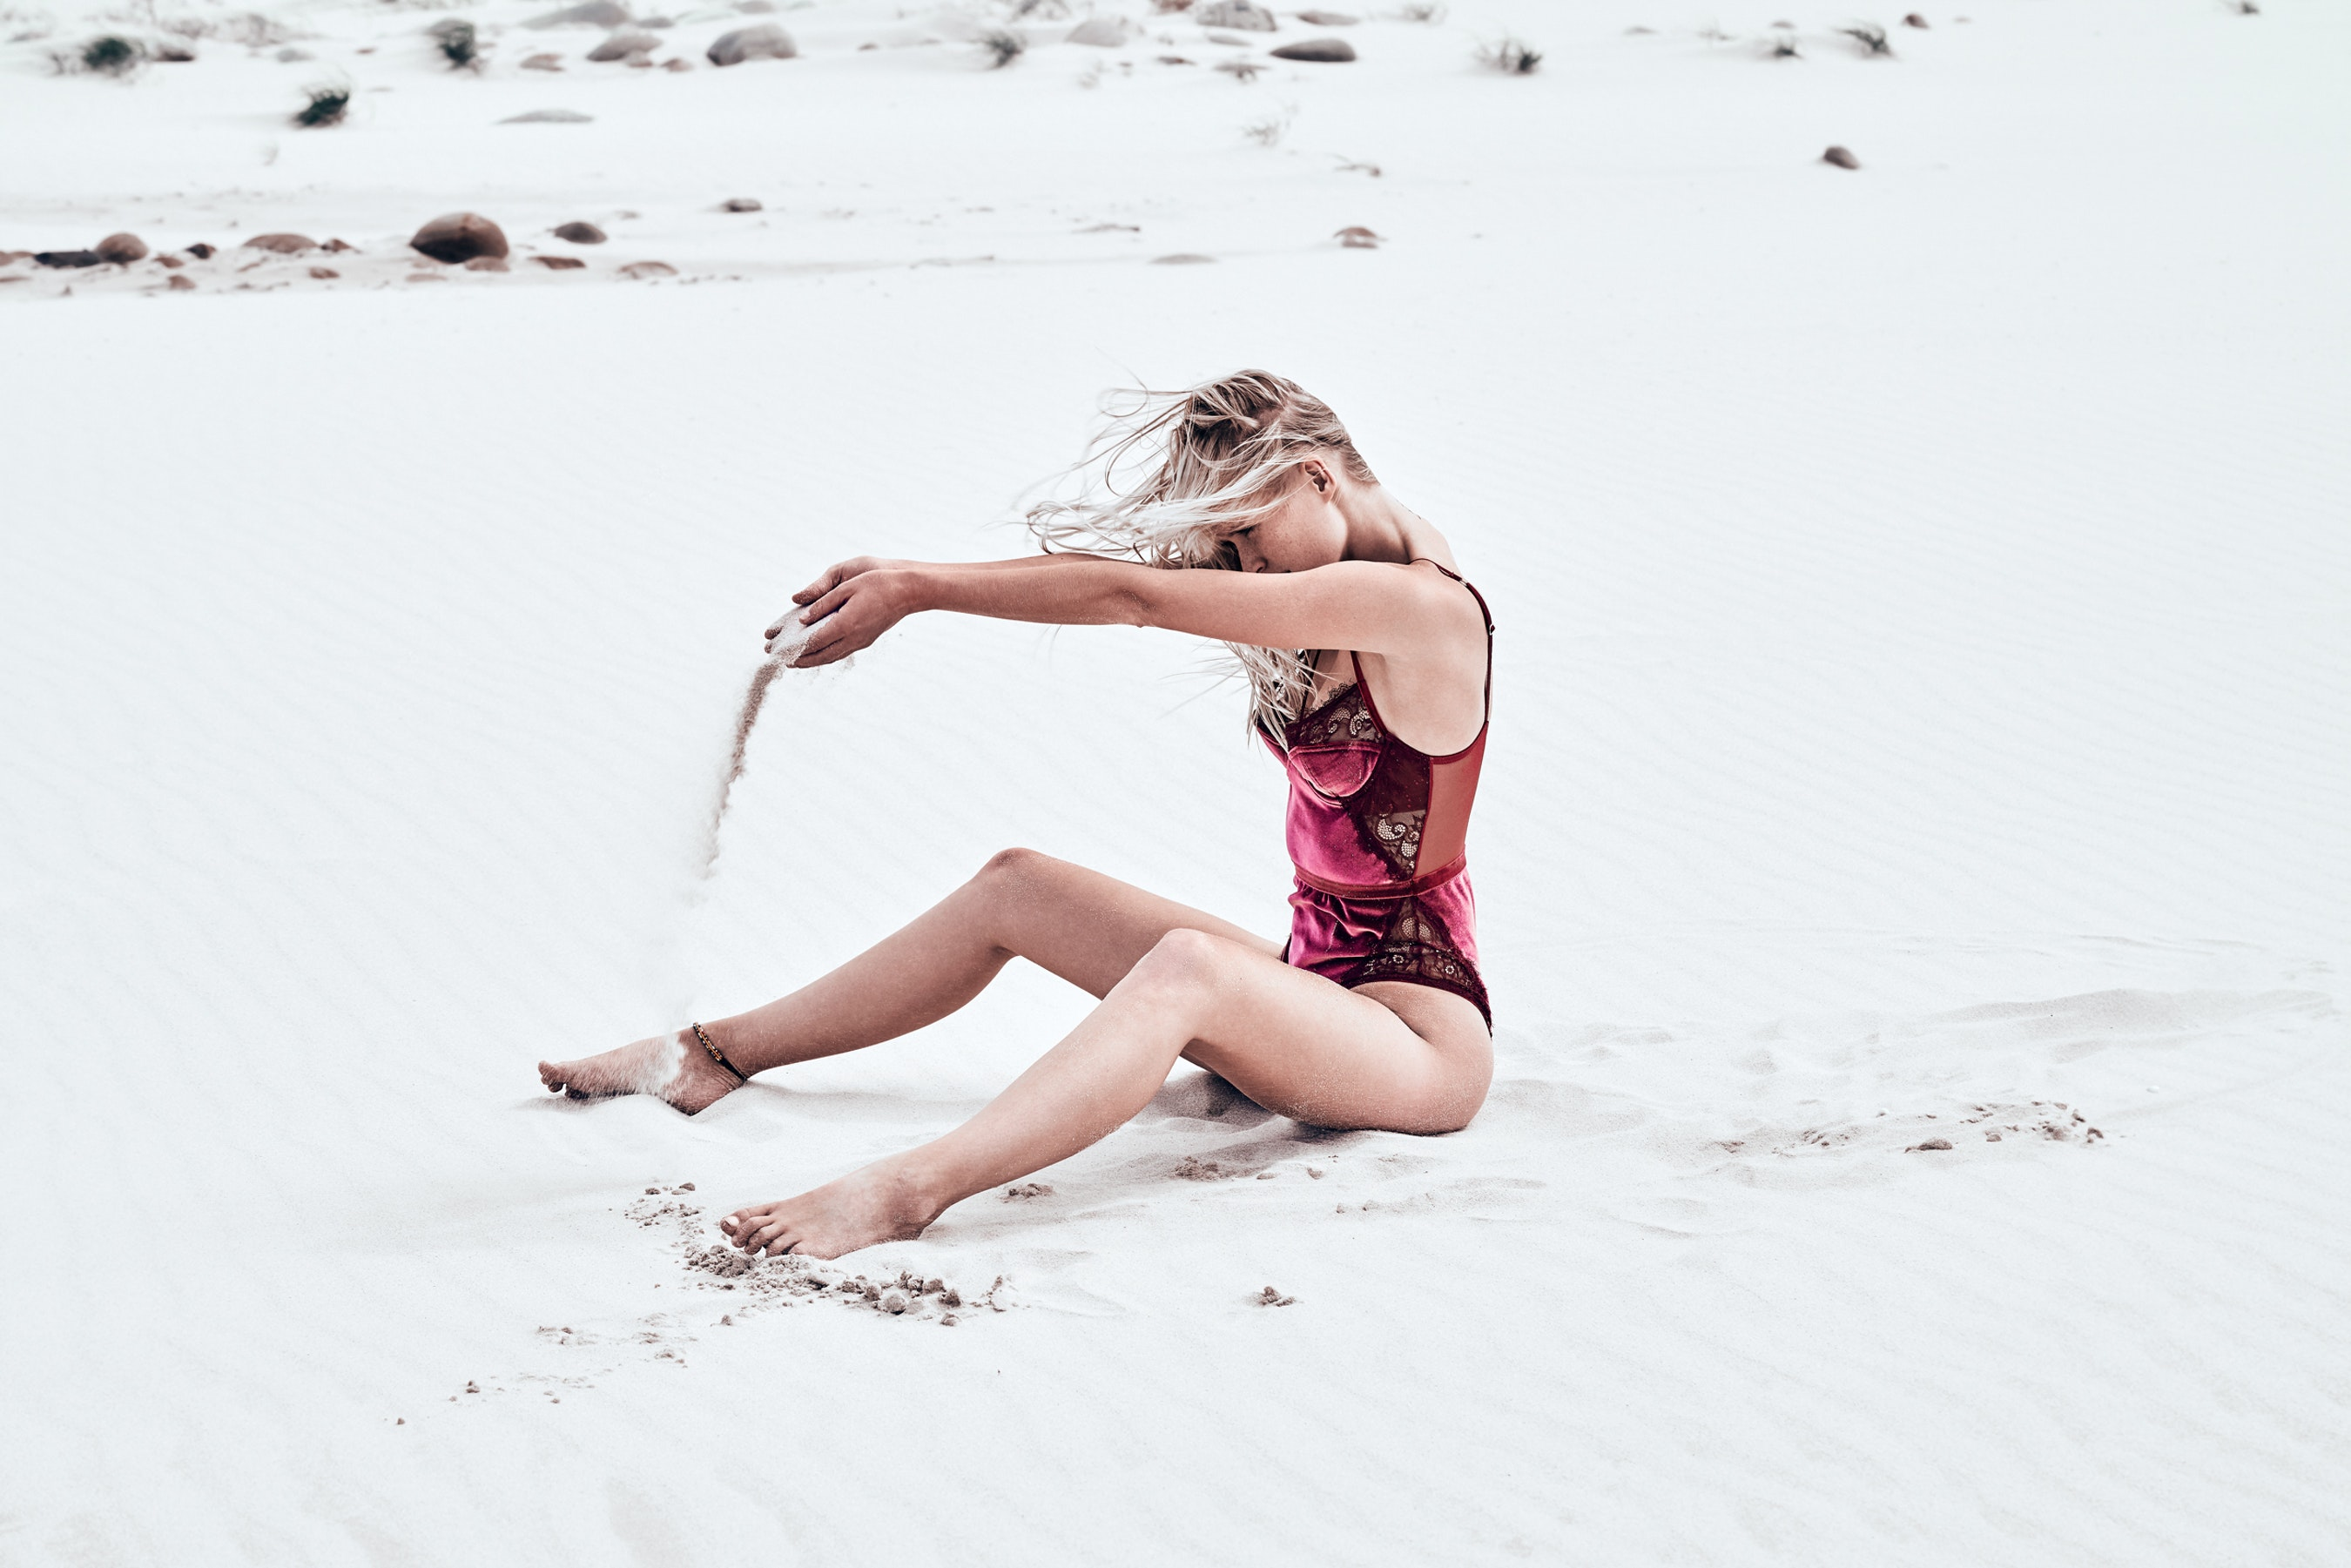 De leukste bikini's voor de warmste dagen